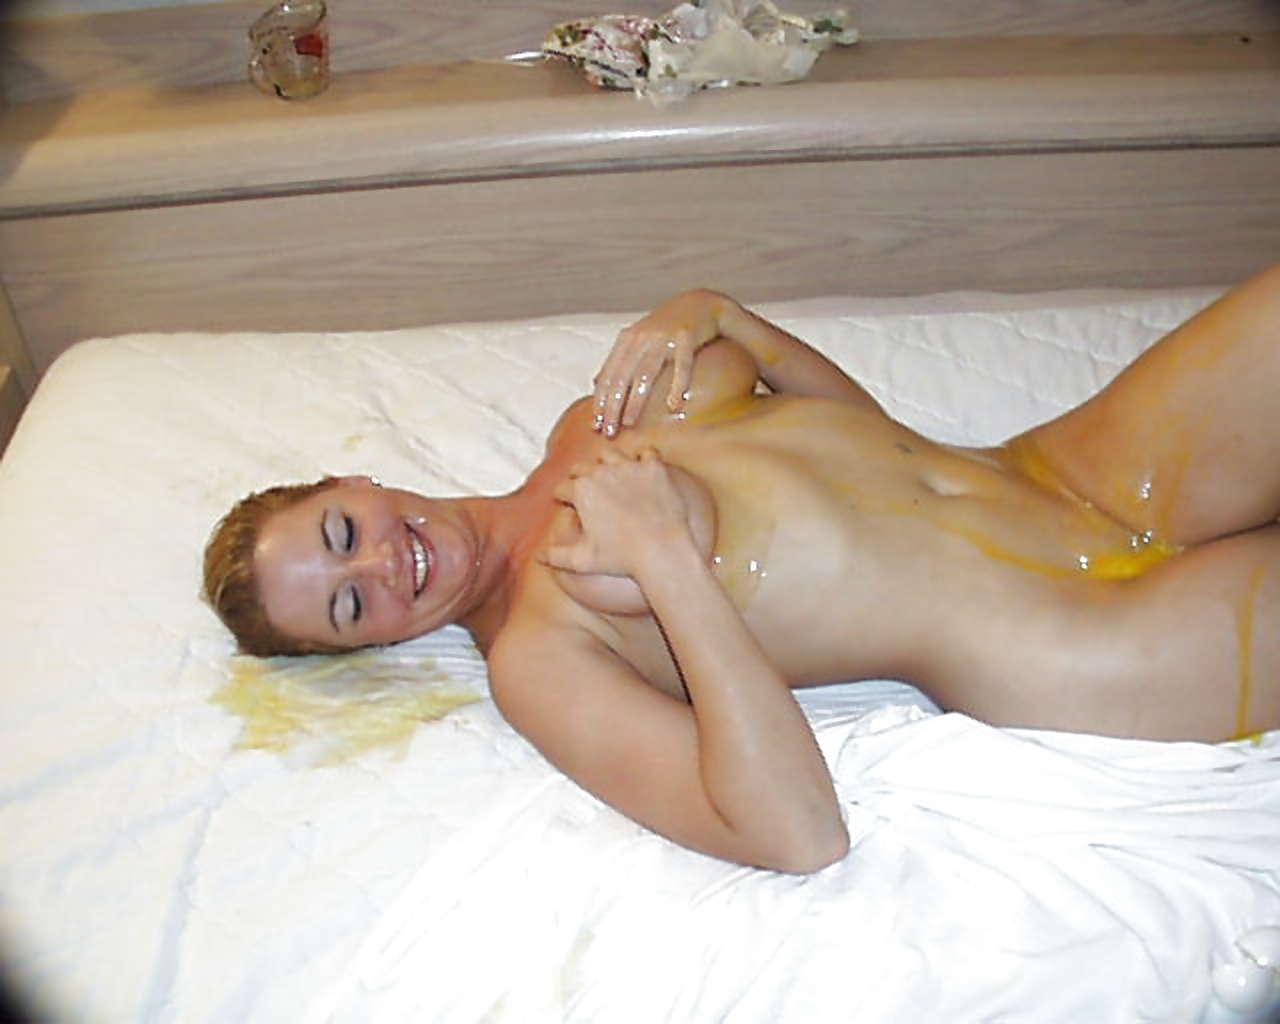 Free sunny wwe tammy sytch nude